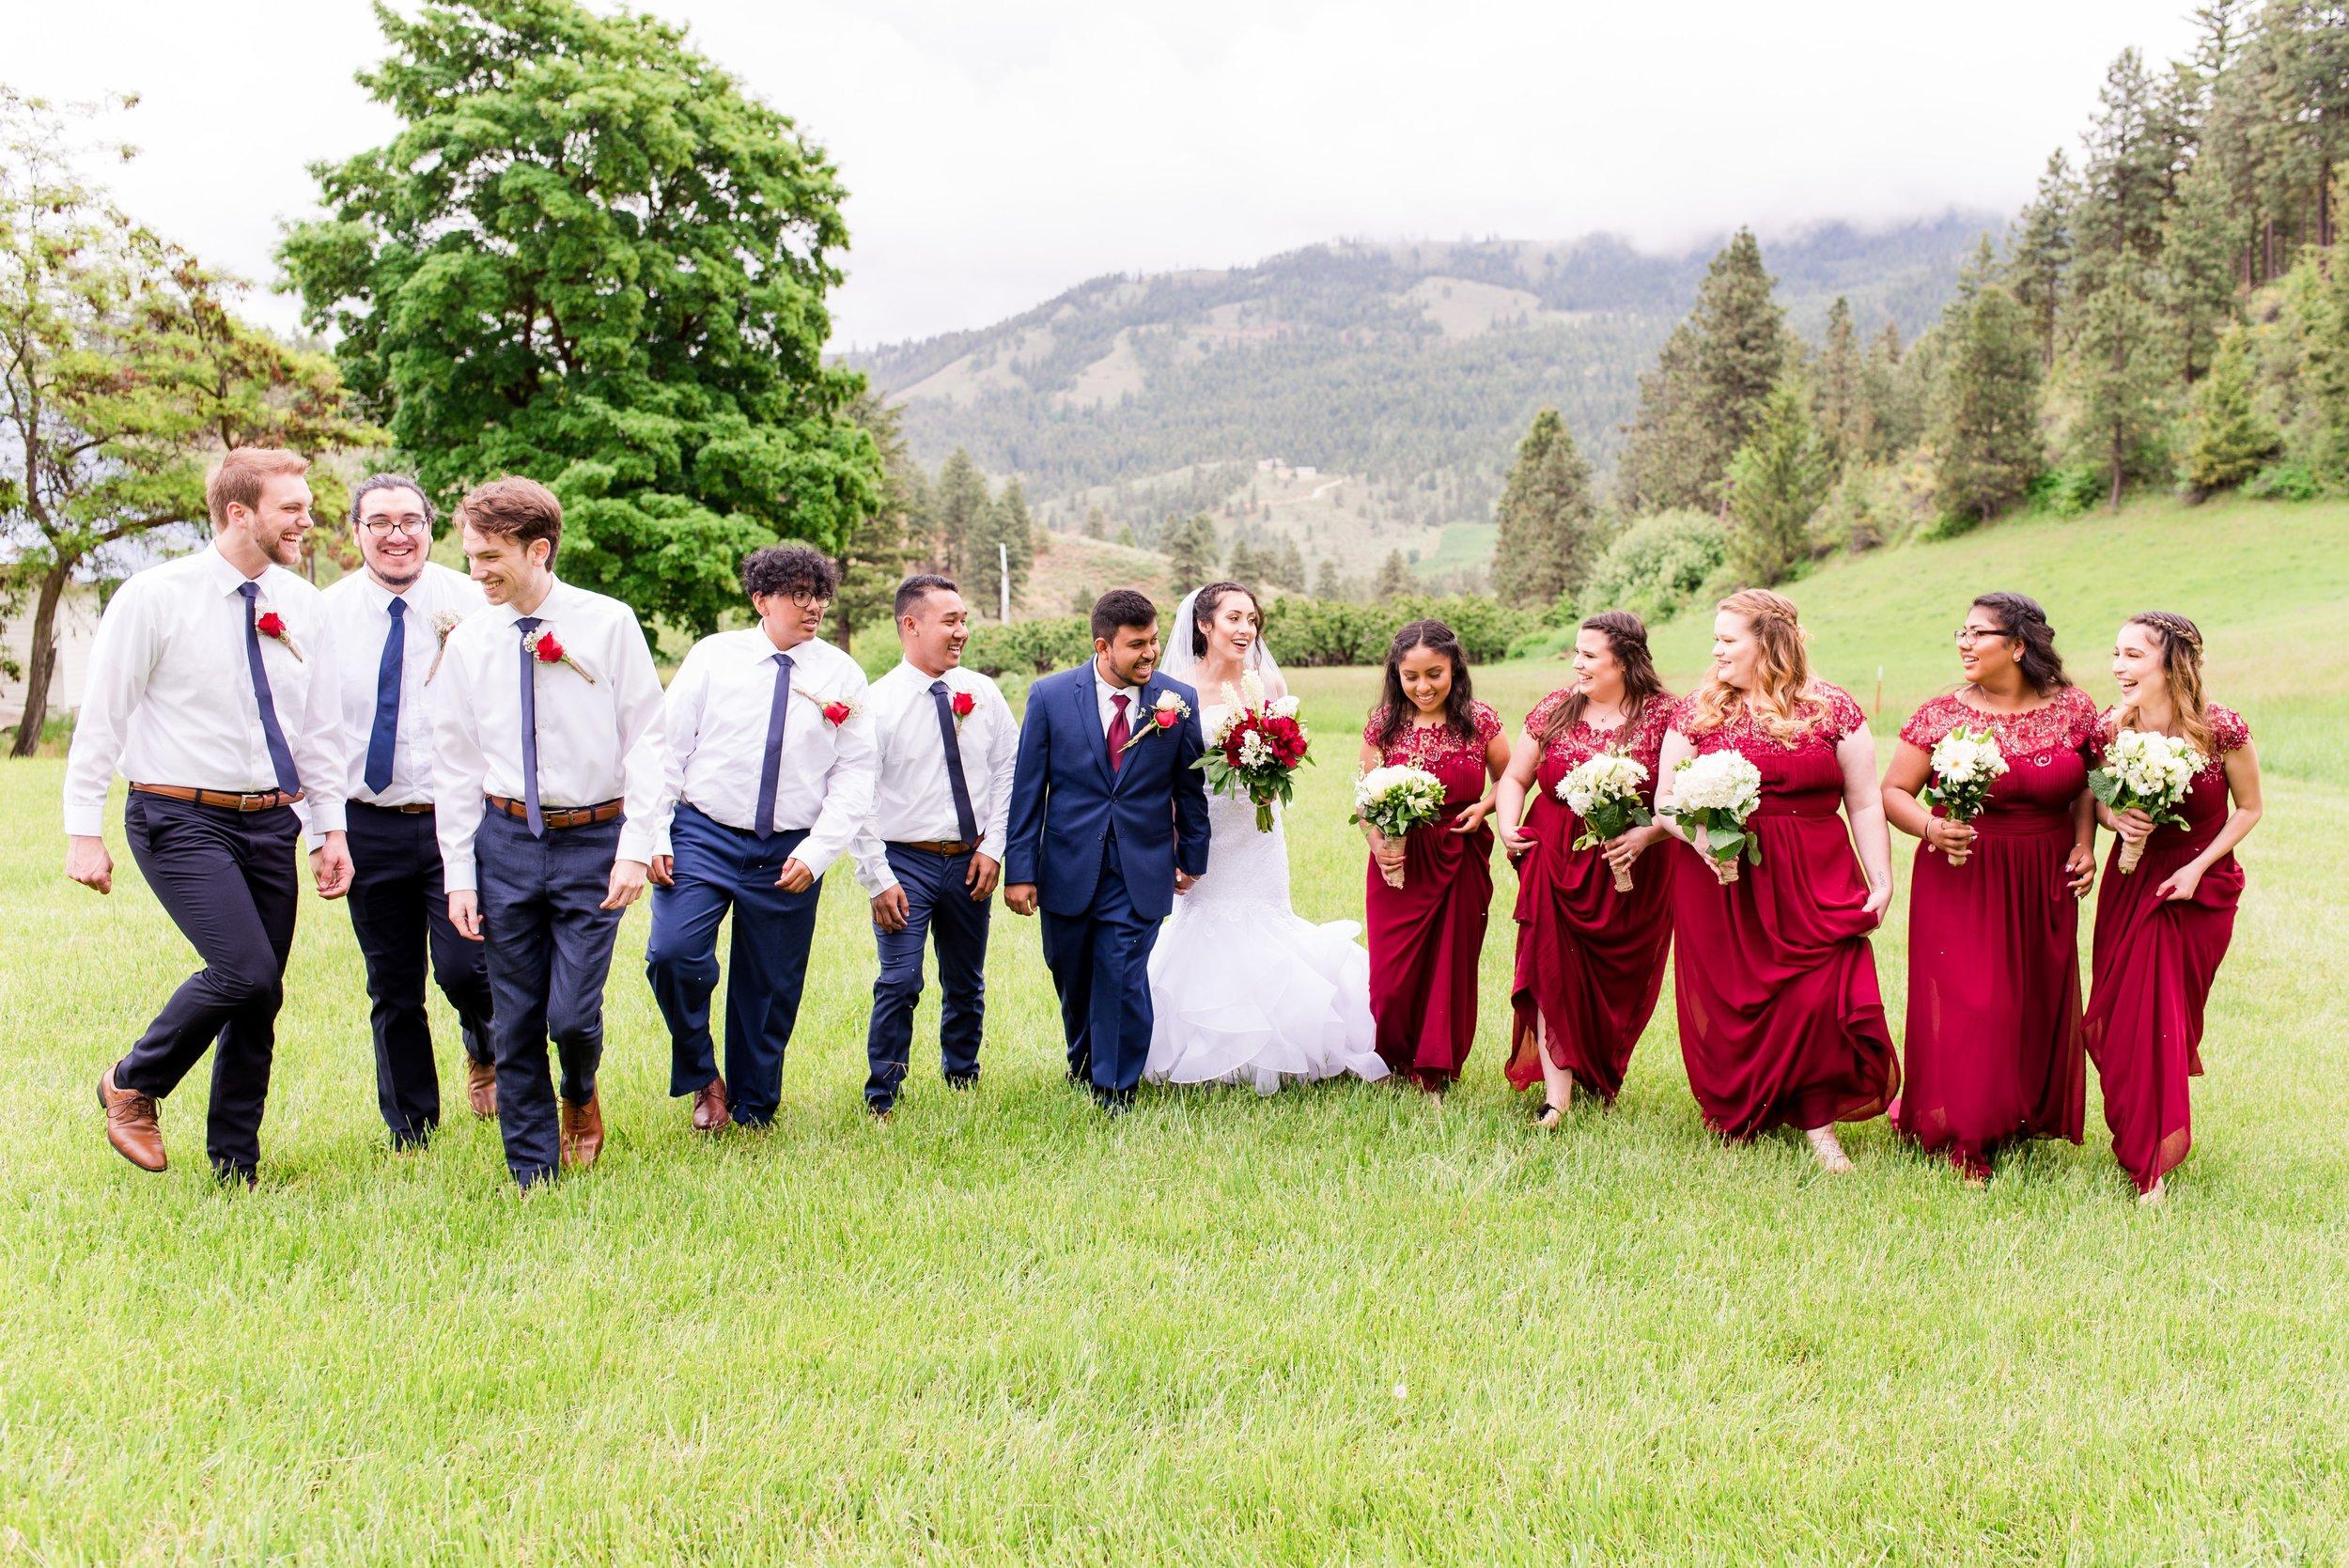 Bridal Party Photos - Wenatchee, WA Hampton Hideaway White Barn Wedding - Wenatchee, Washington Wedding Photographer - Morgan Tayler Photo & Design - Tri Cities, WA Wedding Photographer